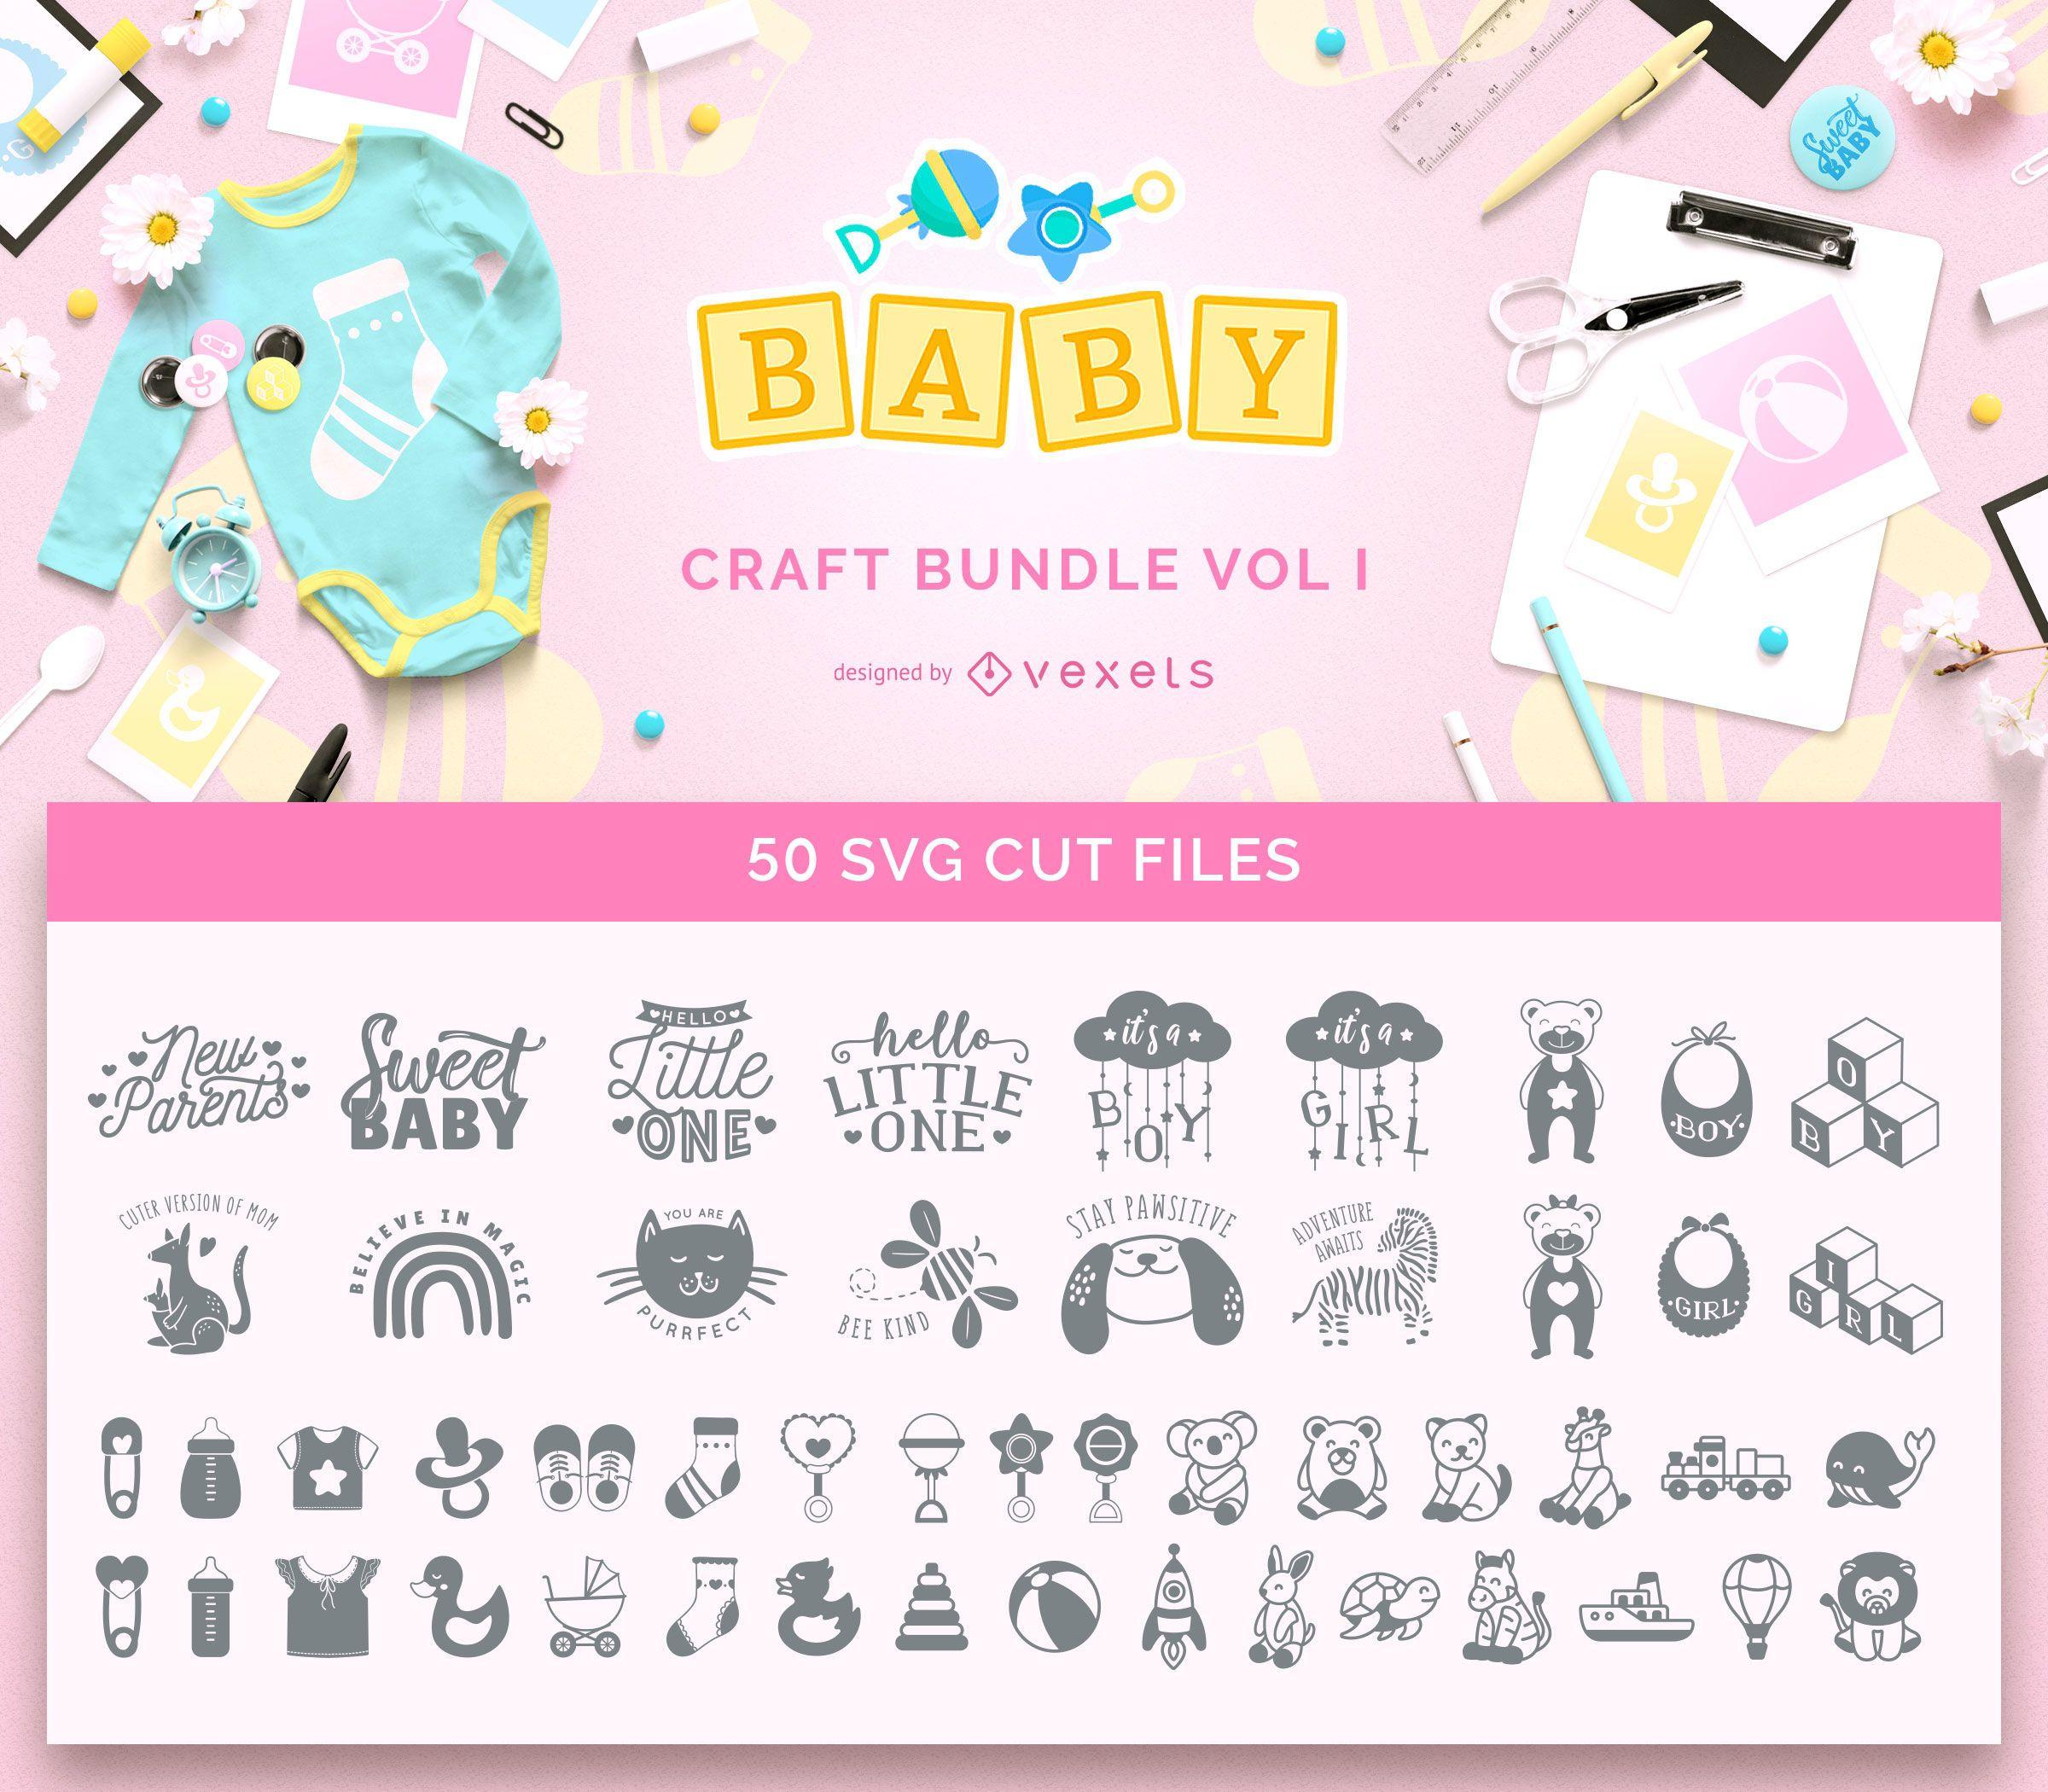 Paquete de manualidades para beb?s Vol I